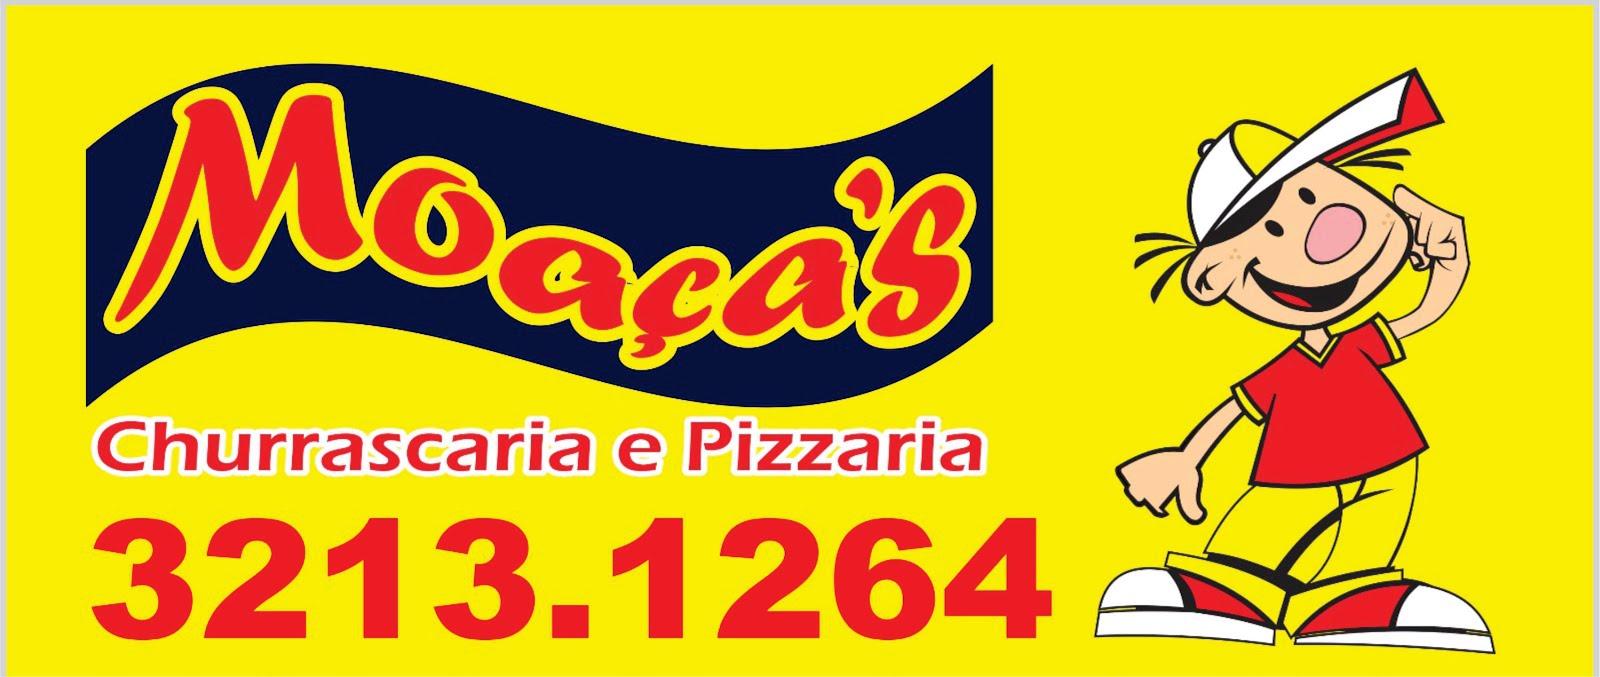 Churrascaria Moaça's